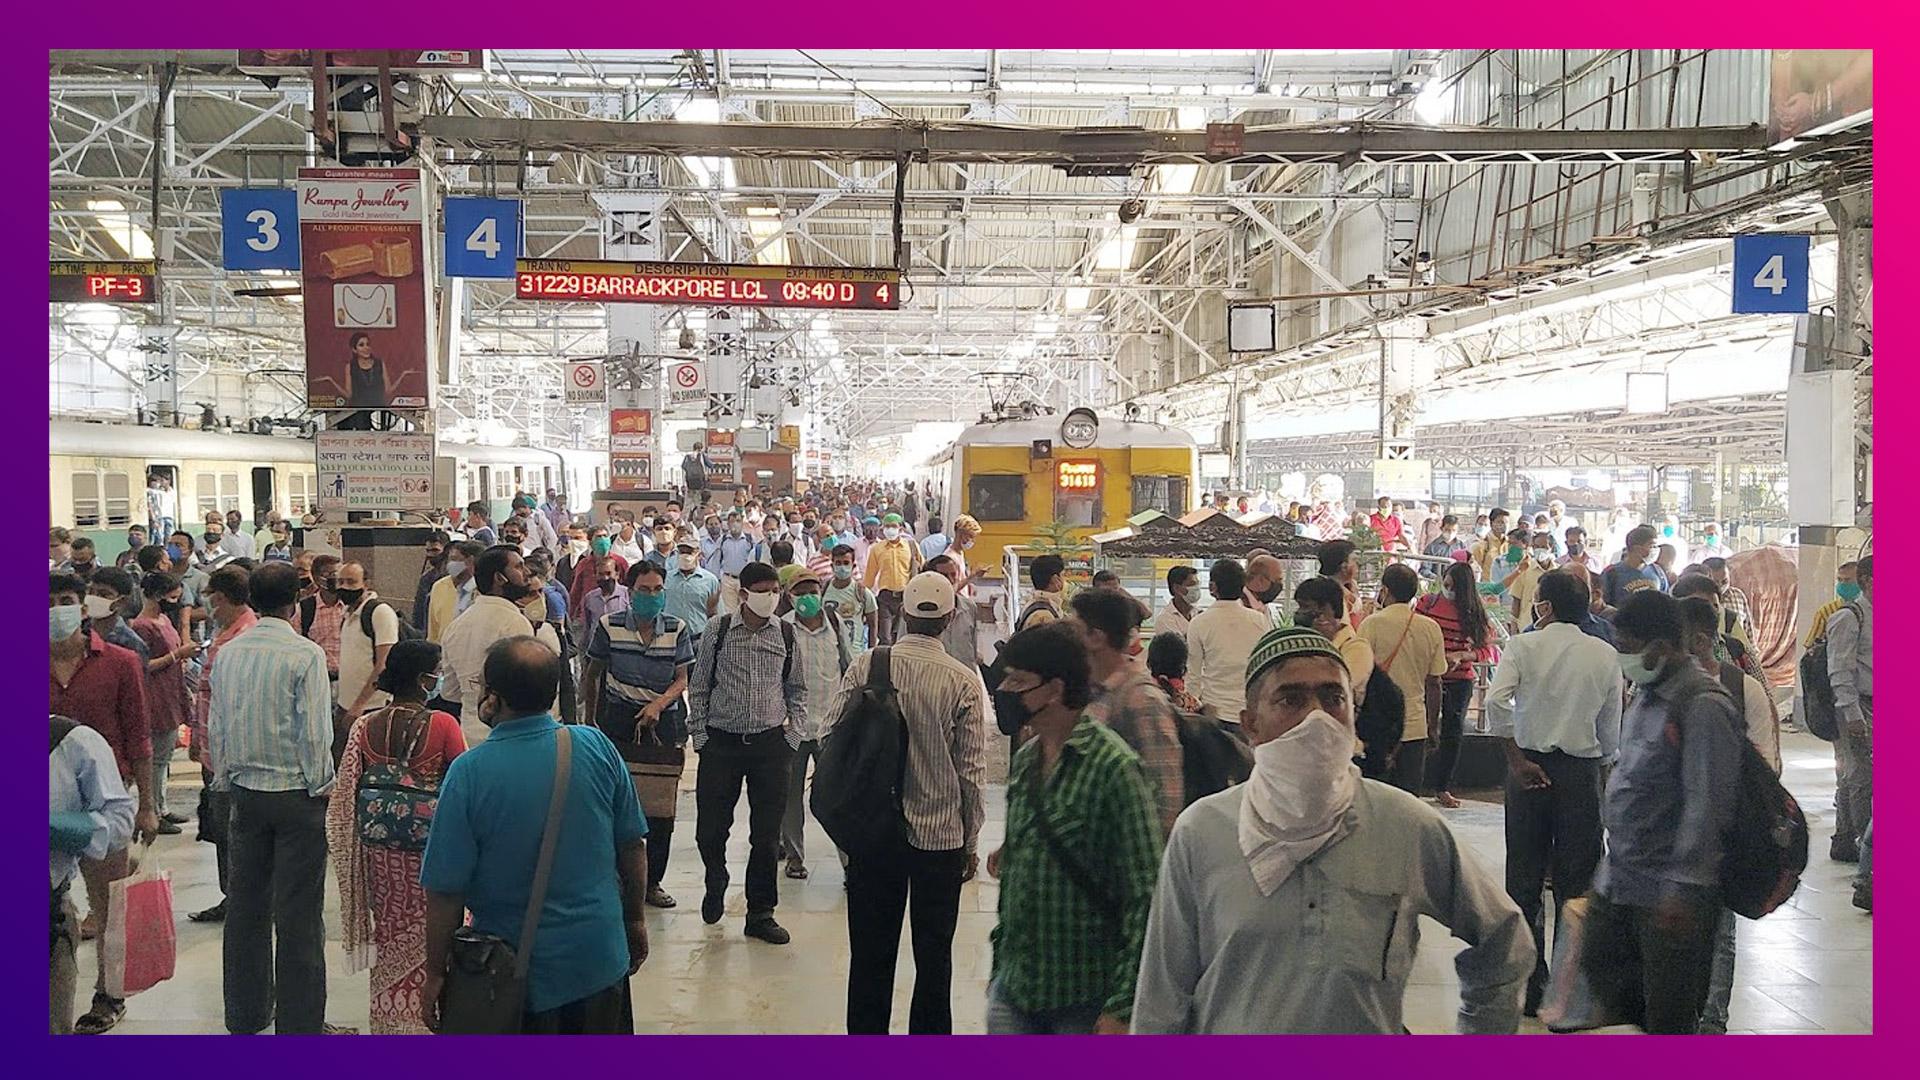 West Bengal Lockdown: এবার চলবে কি লোকাল ট্রেন? অনেক ছাড় দিয়ে রাজ্যে বাড়তে পারে আত্মশাসনের মেয়াদ